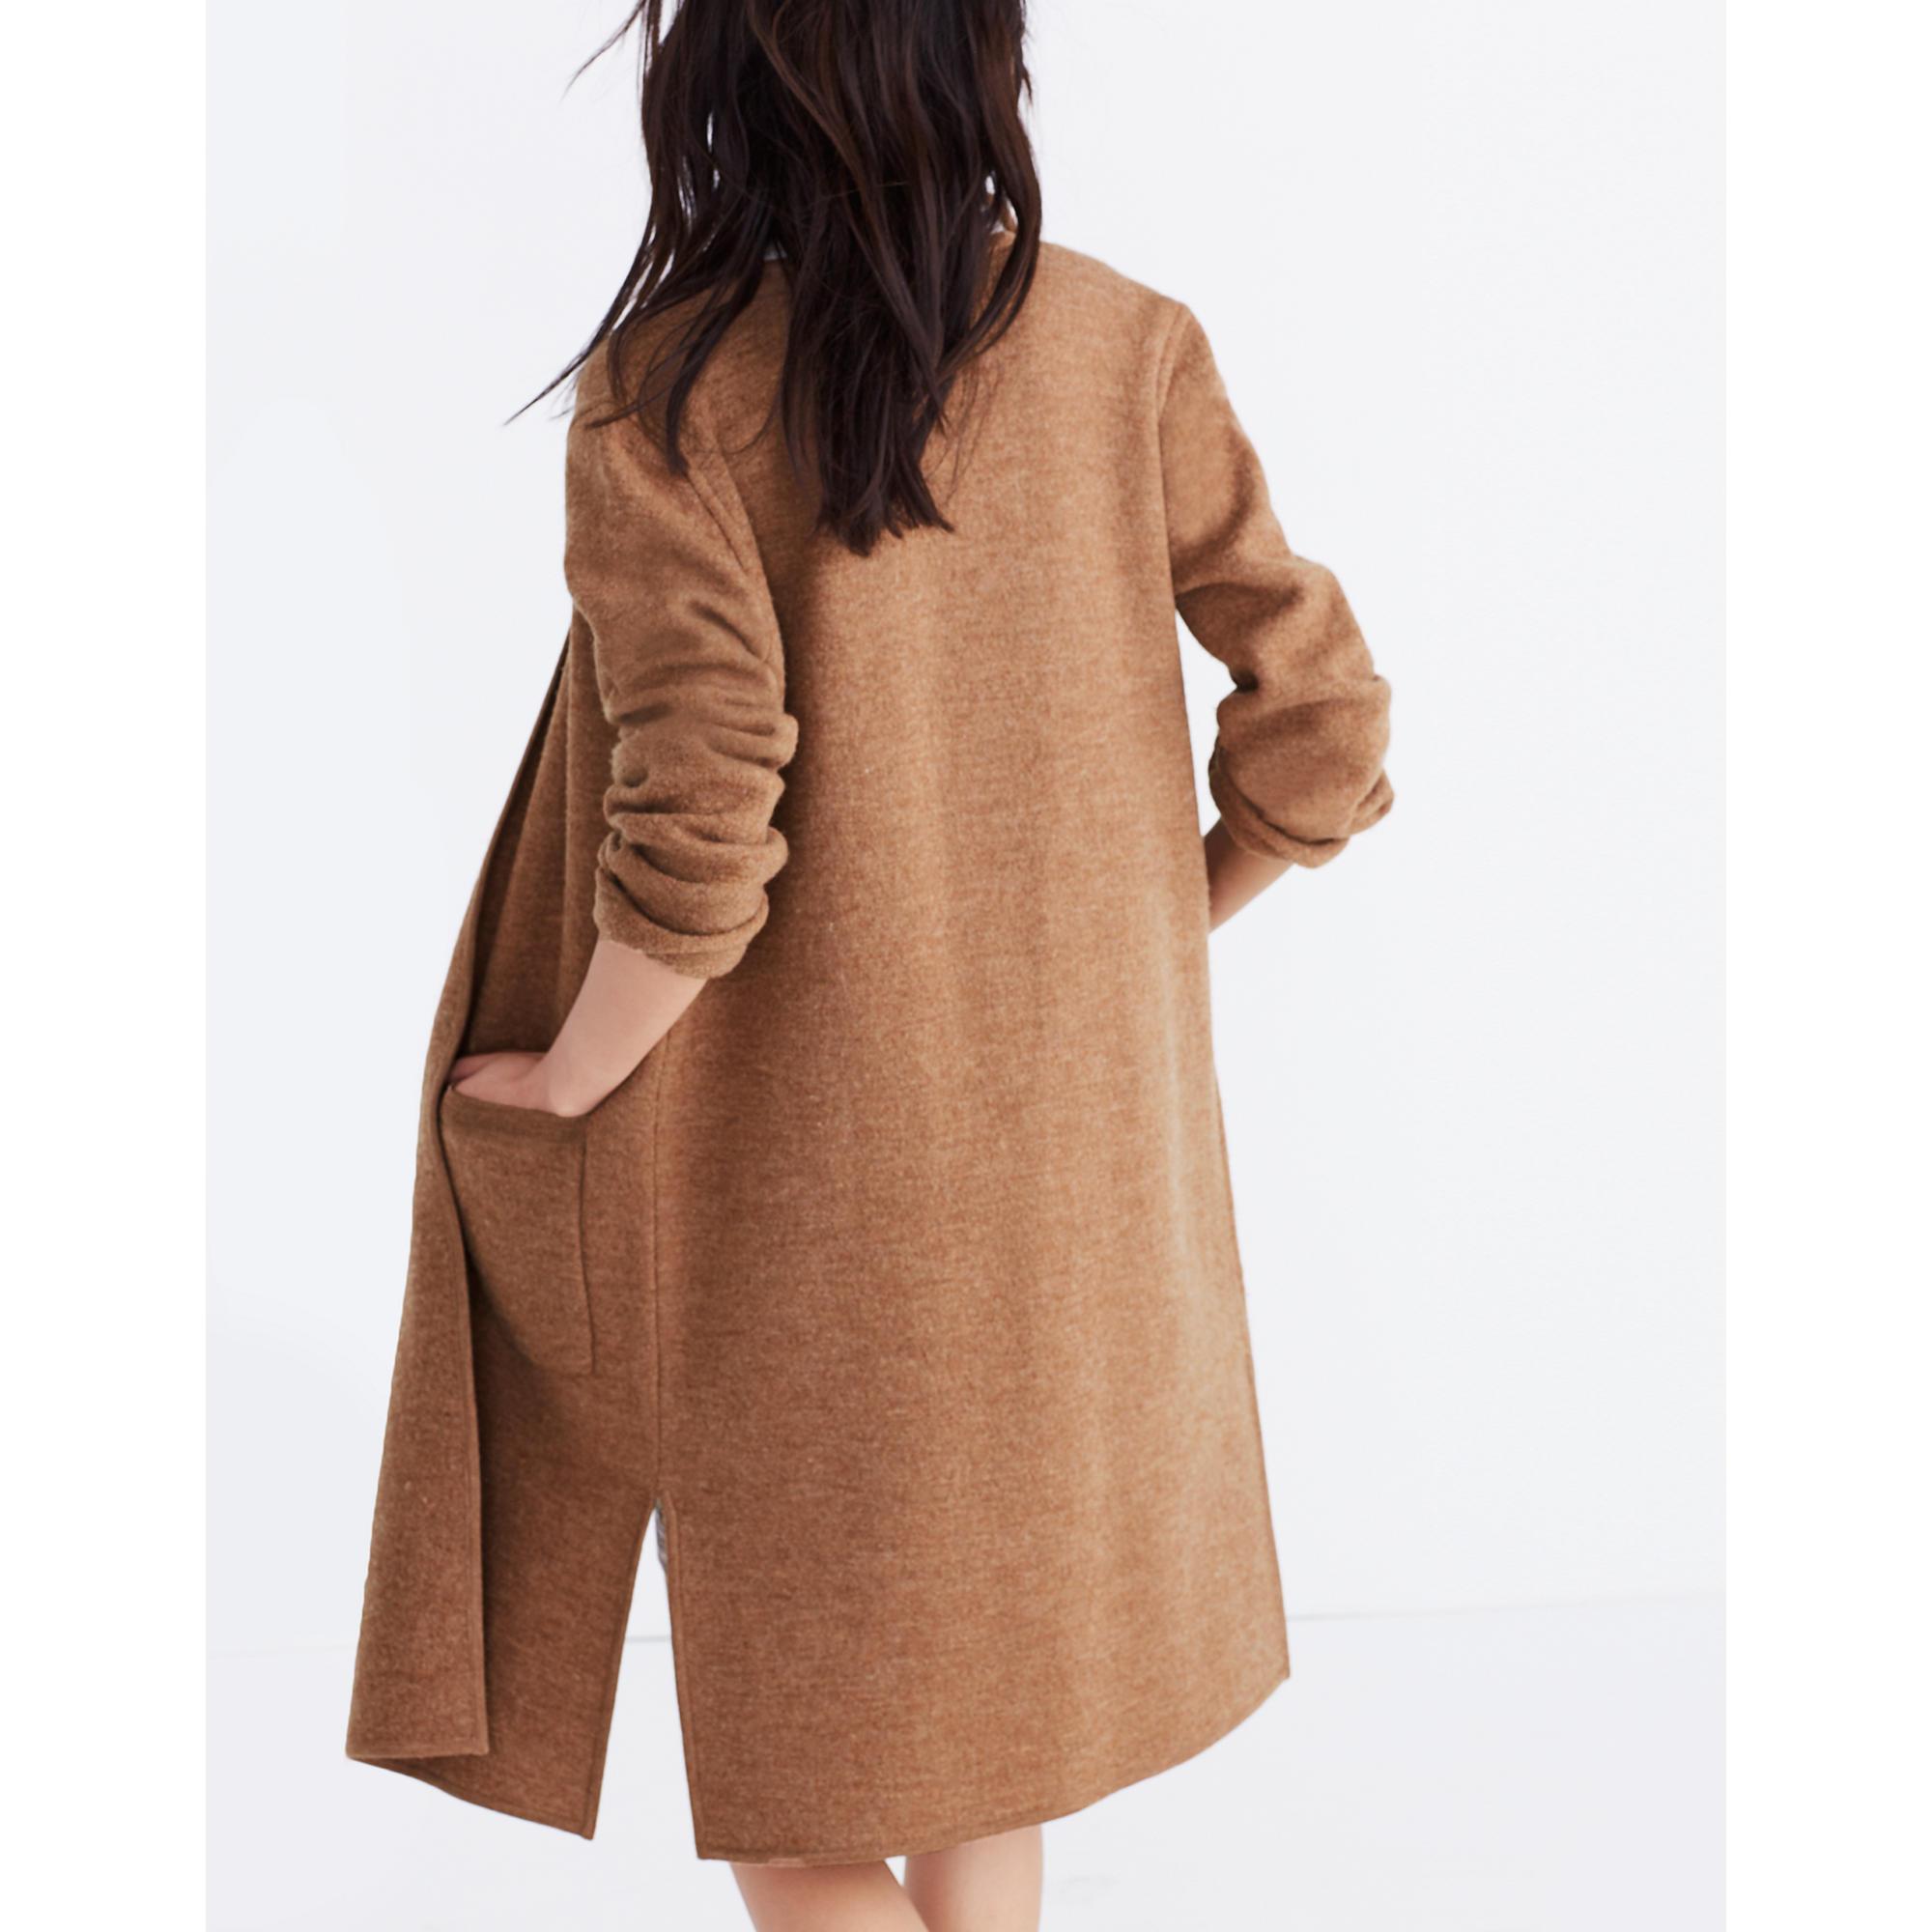 Camden Sweater-Coat : cardigans & sweater-jackets   Madewell